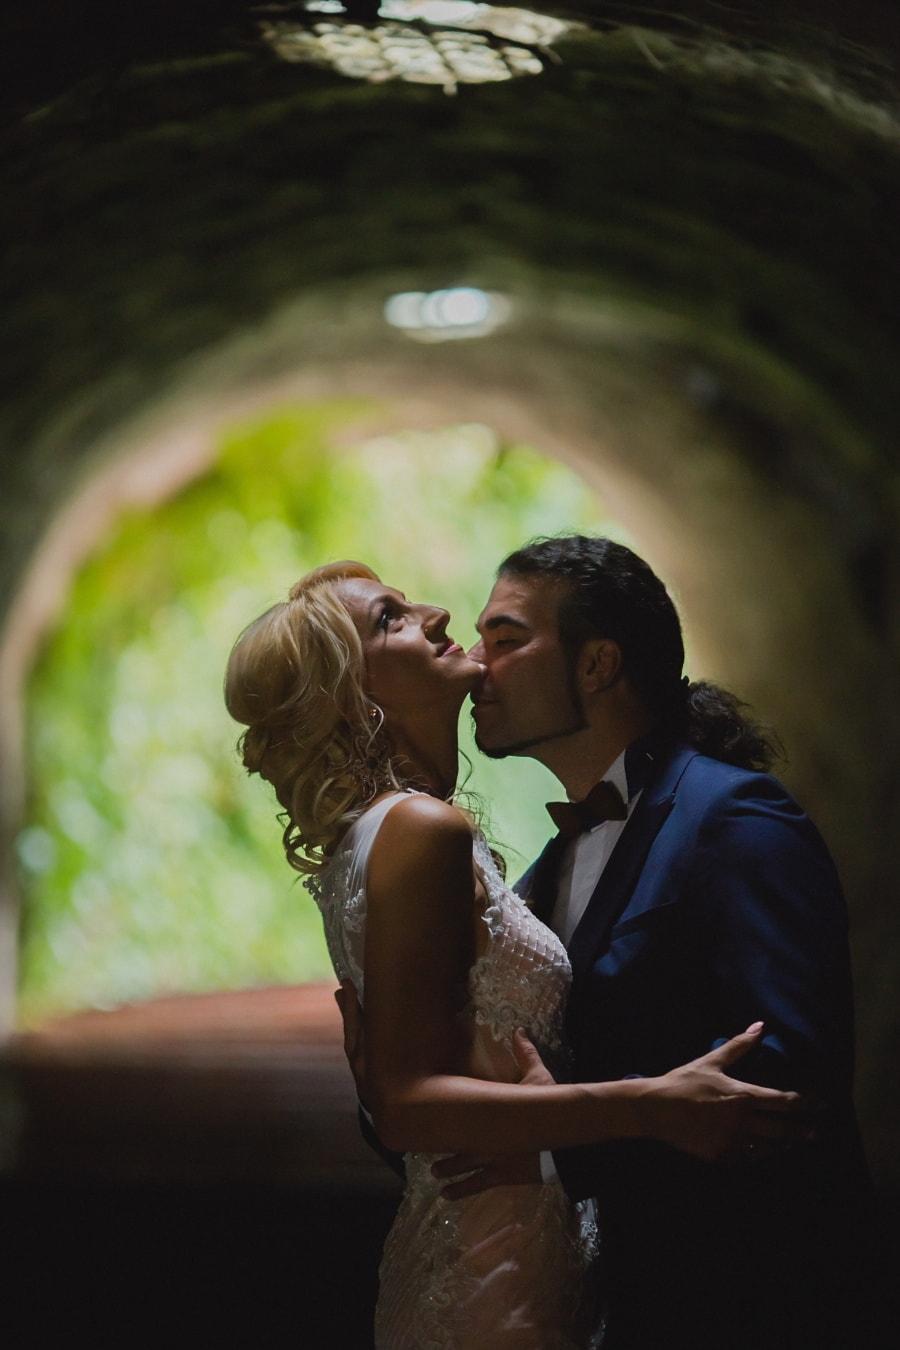 tunnel, boyfriend, kiss, girlfriend, glamour, lady, gorgeous, groom, affection, love